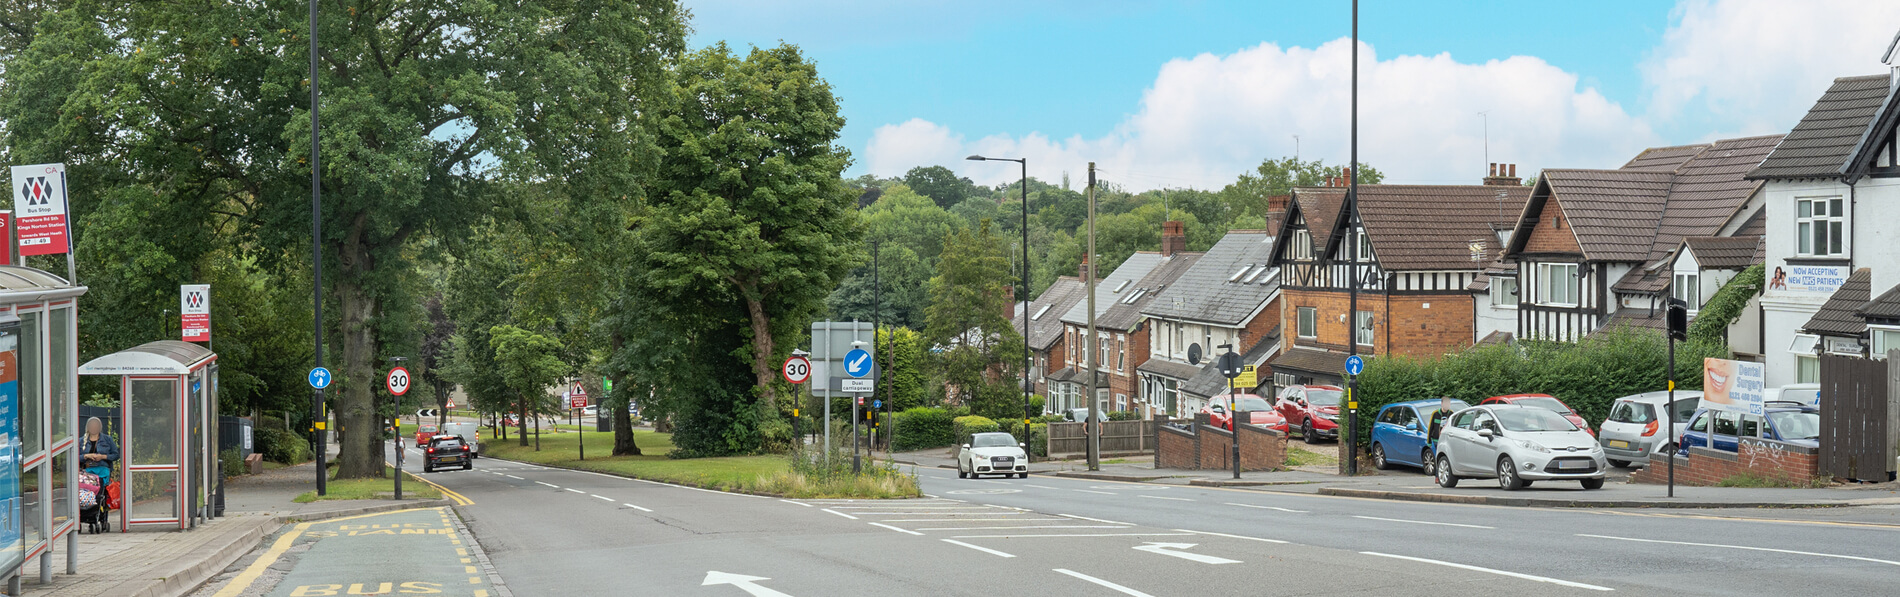 Area Guides for Birmingham - Kings Norton (1)